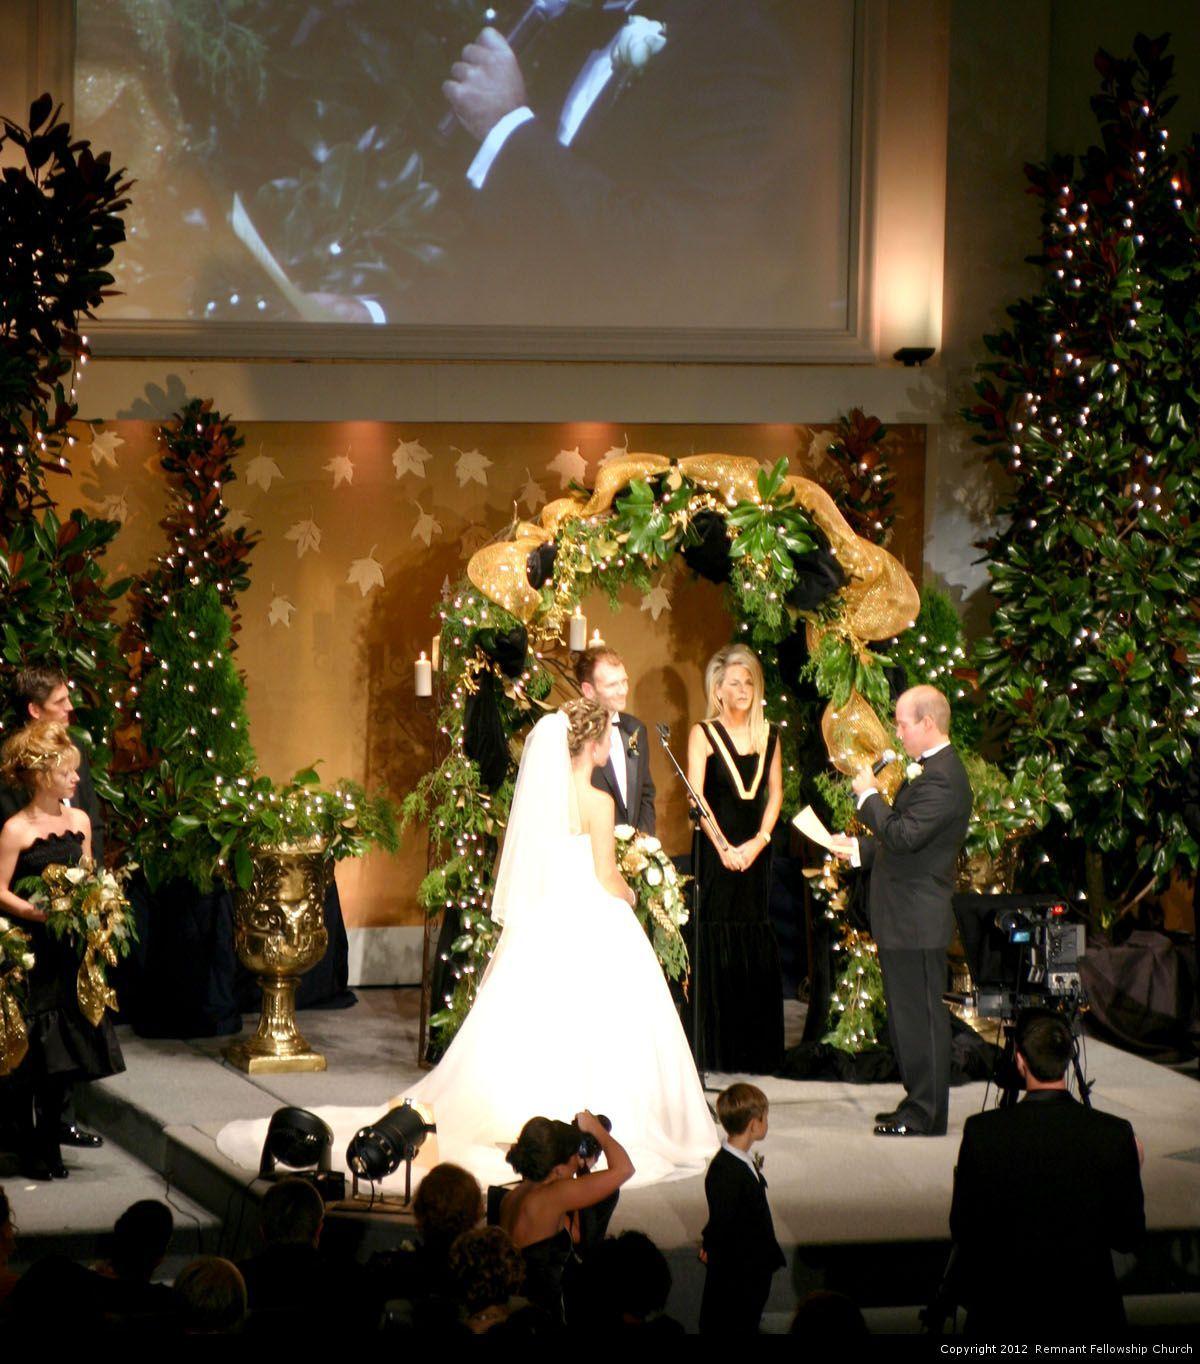 Powers Remnant Fellowship Church Wedding